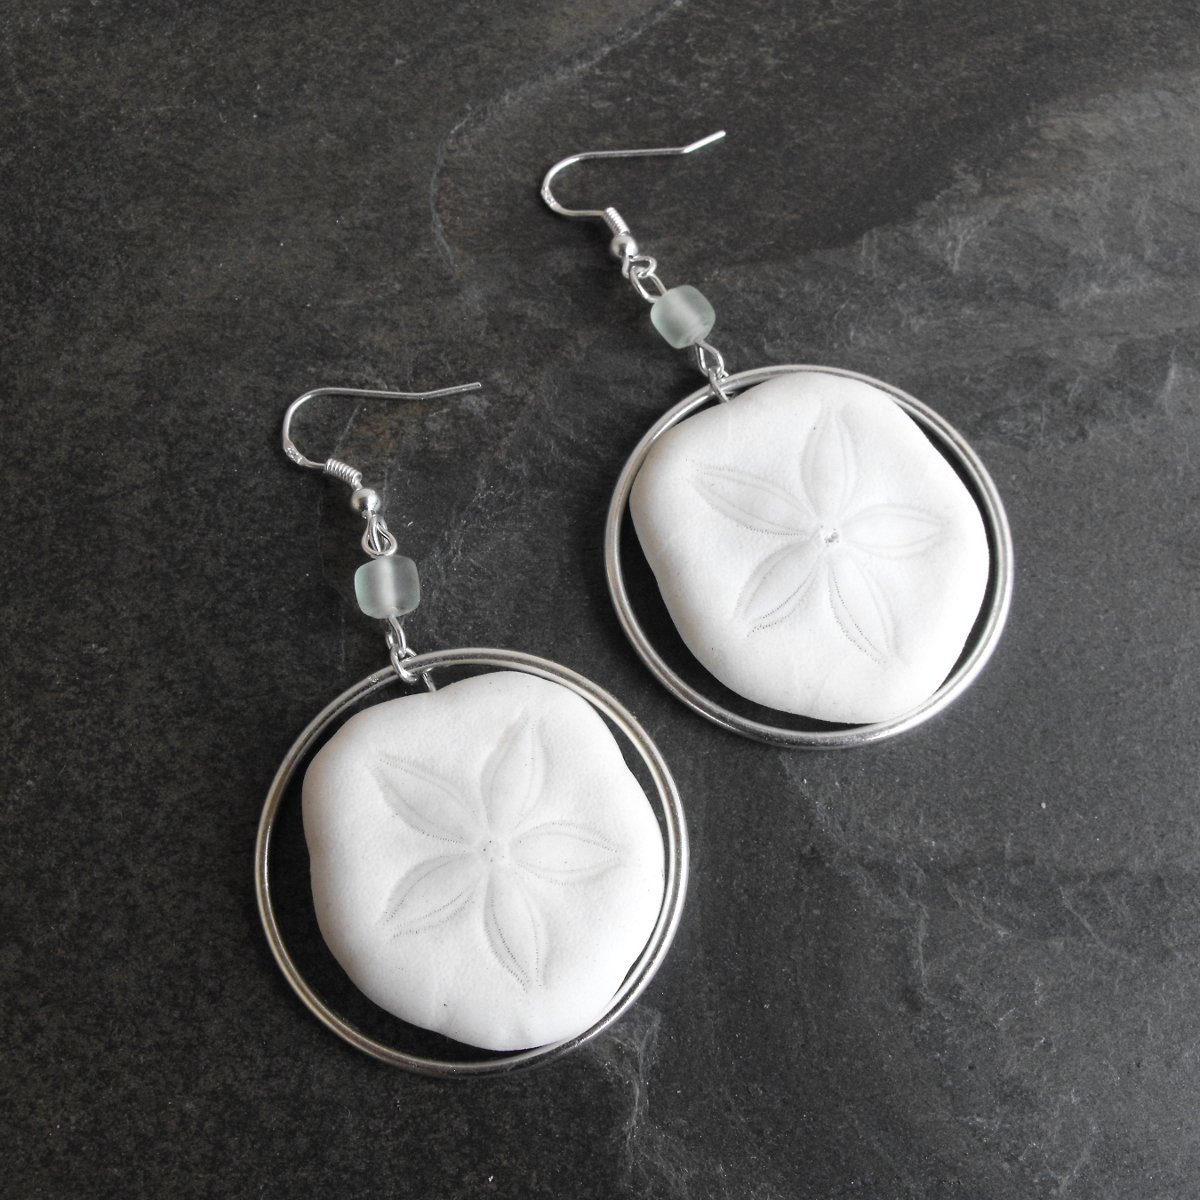 Natural Beach Sand Dollar Earrings - Reserved